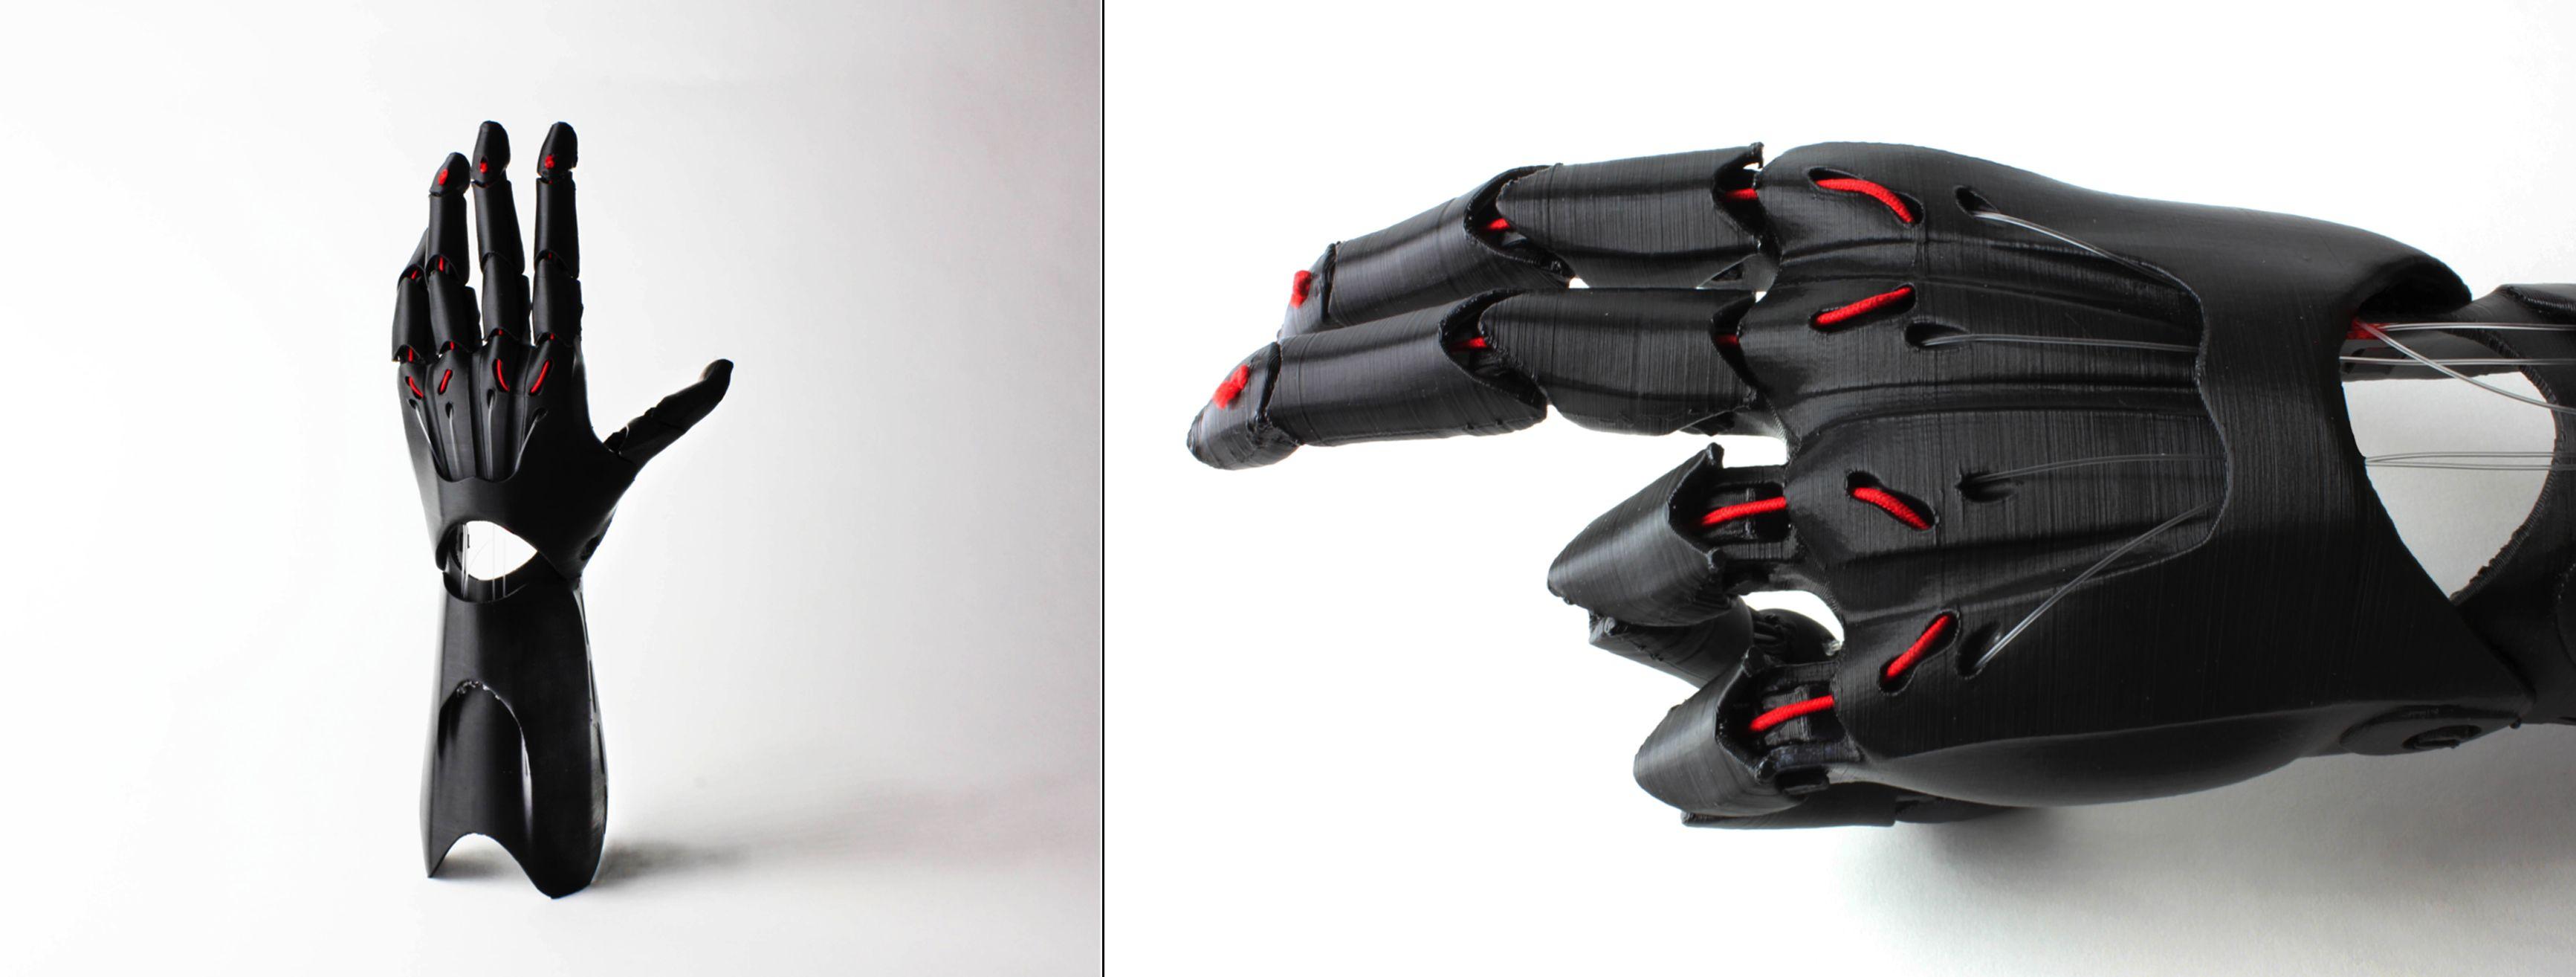 e-nable_3d_systems1_3d_druck_3d_printing_prosthetics